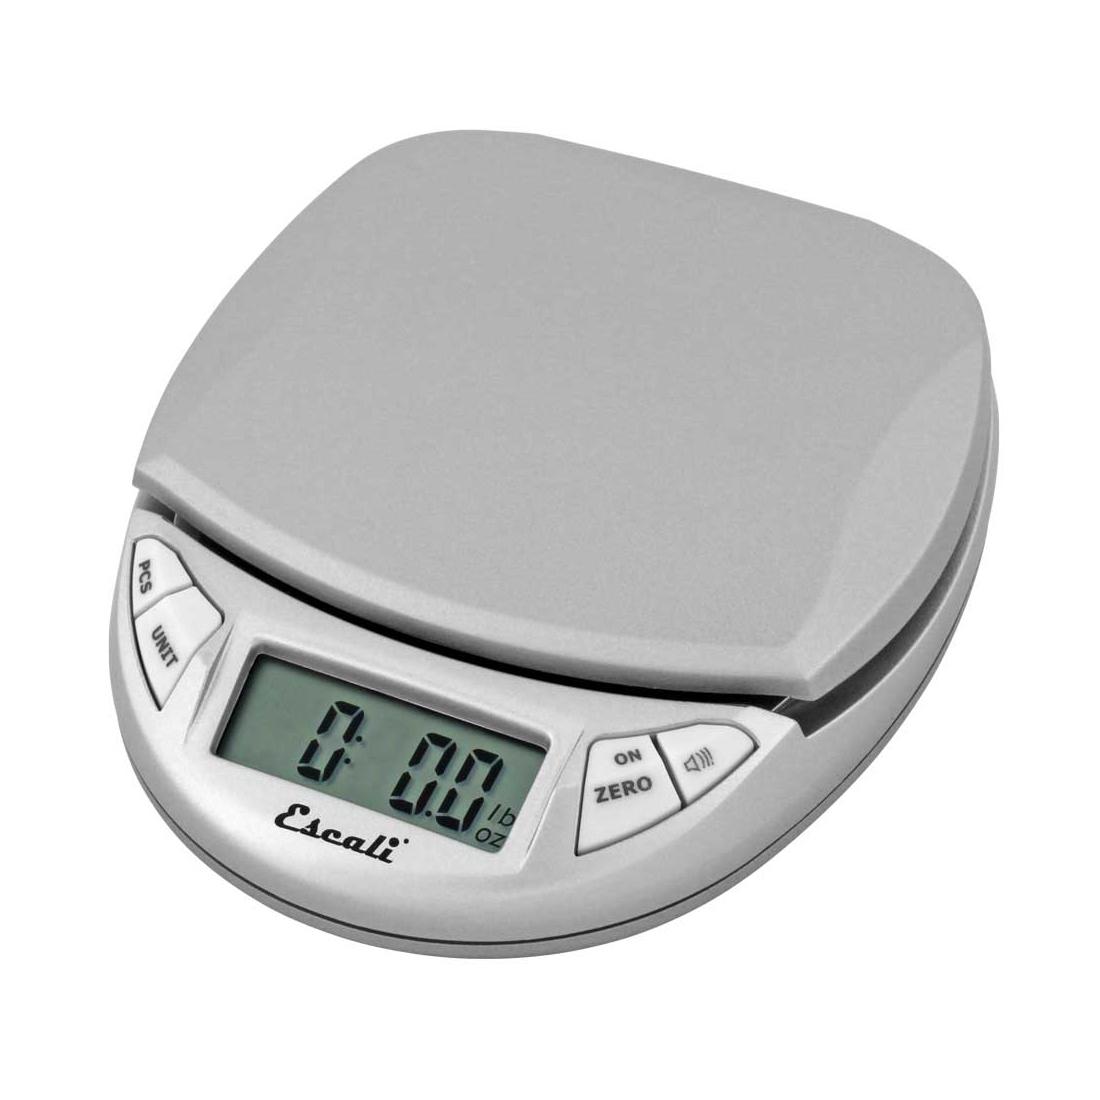 San Jamar SCDG11GYR scale, pocket